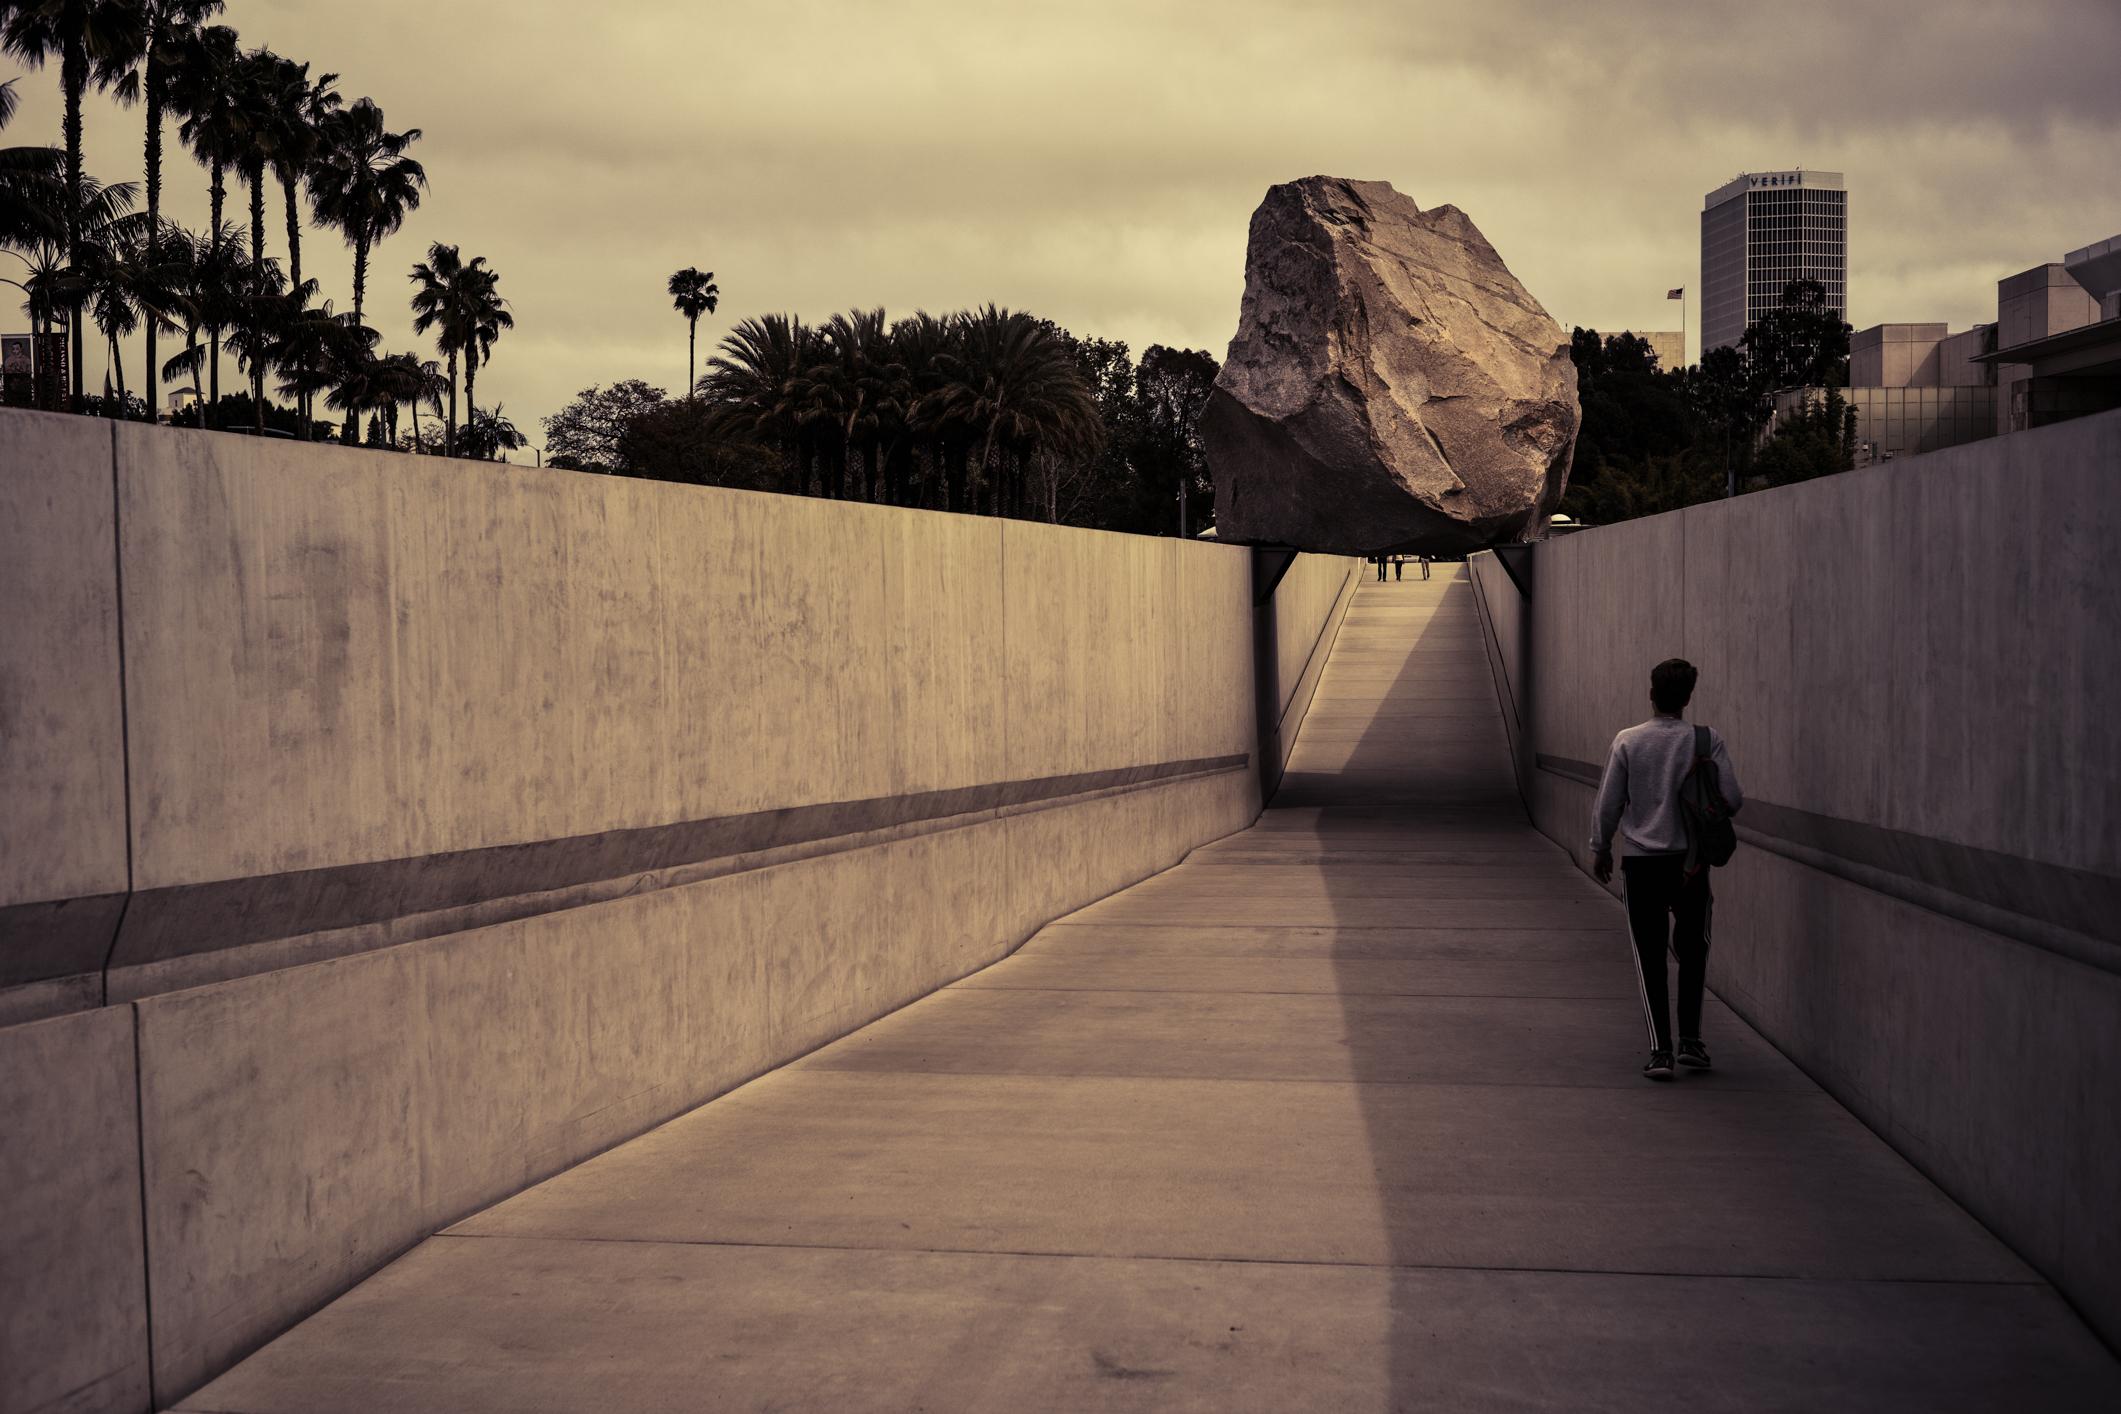 Los-Angeles-LACMA-stone-walkway.jpg